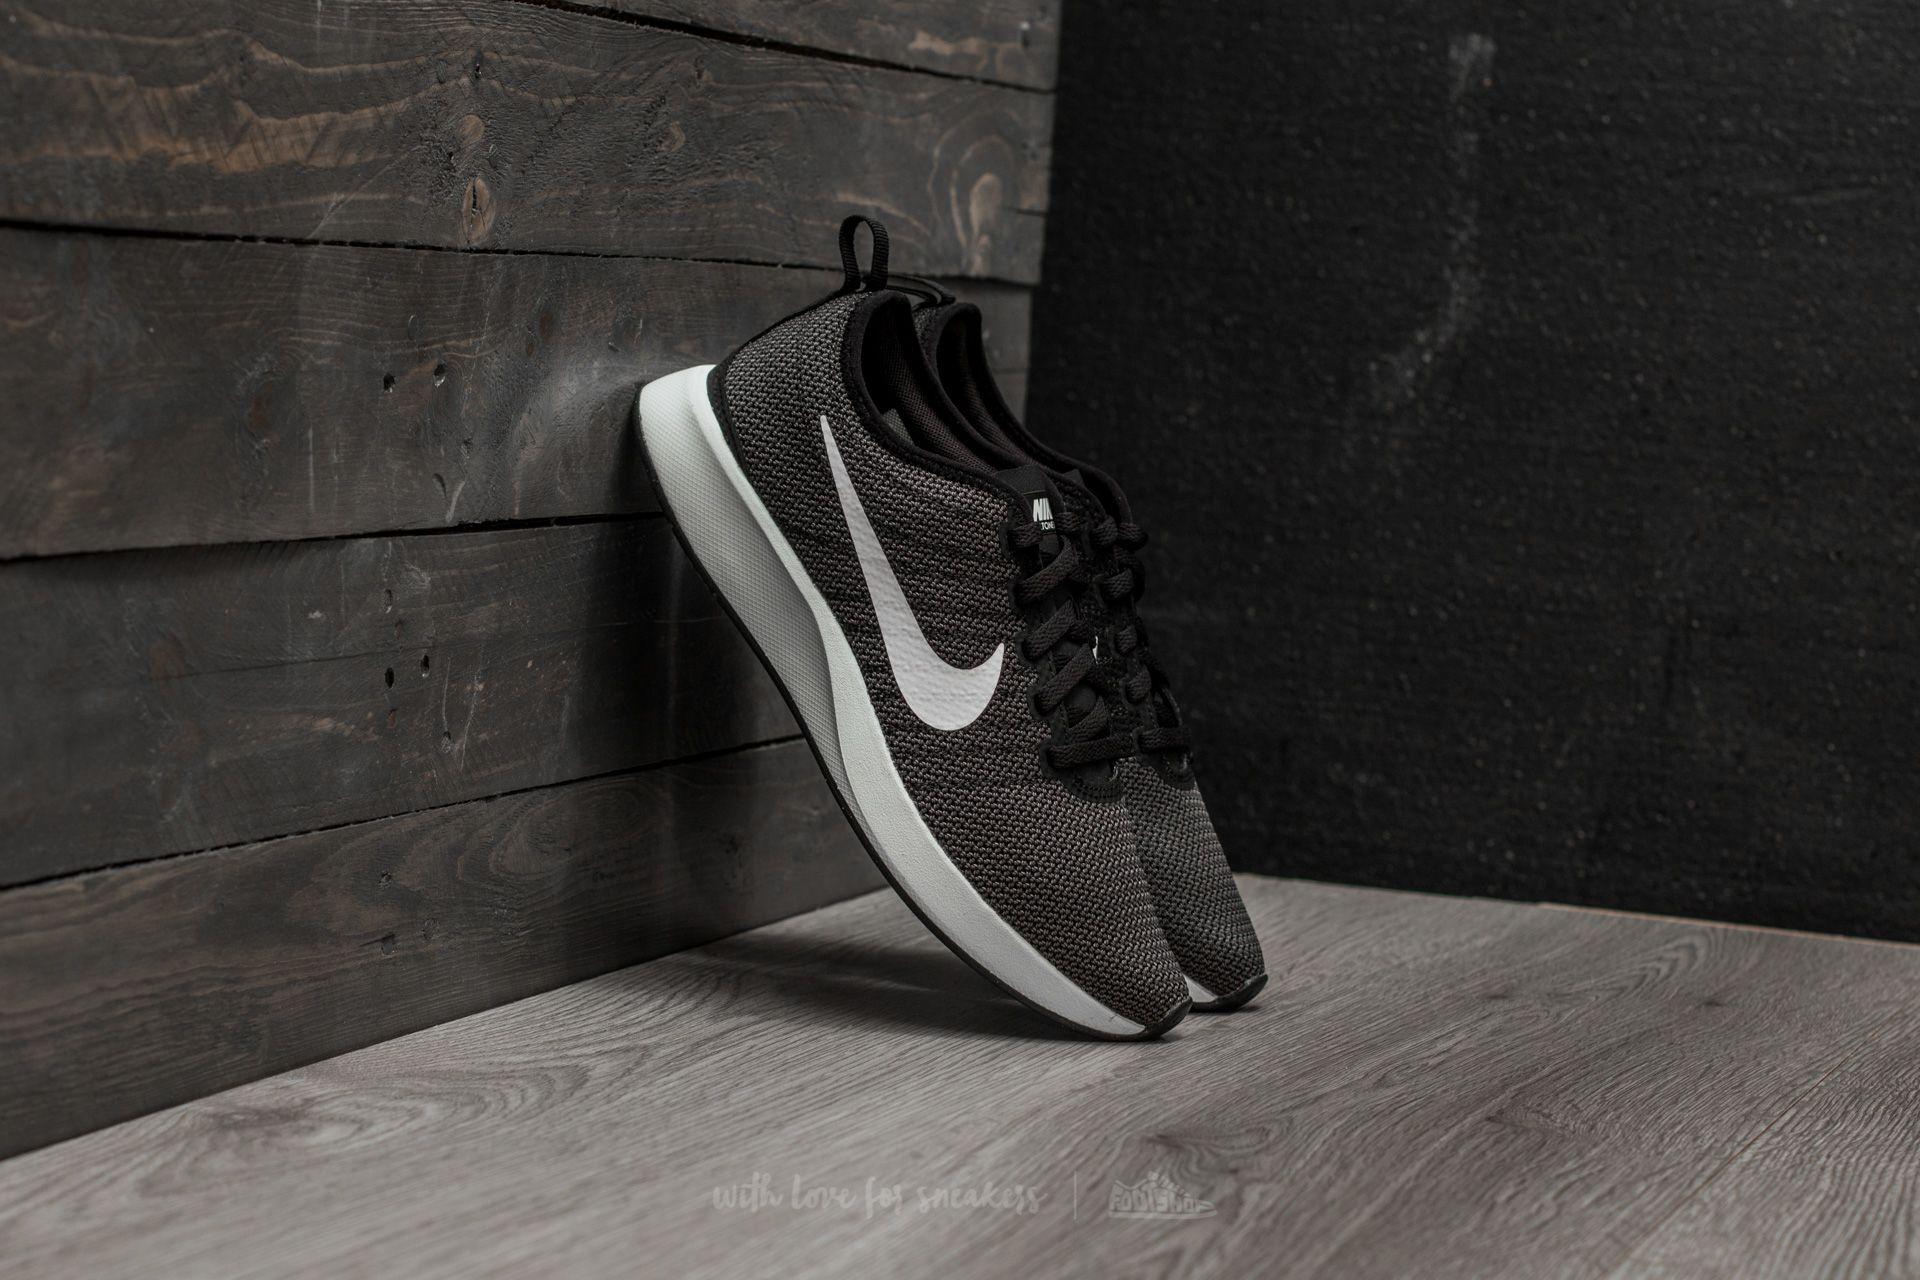 Nike Wmns Dualtone Racer